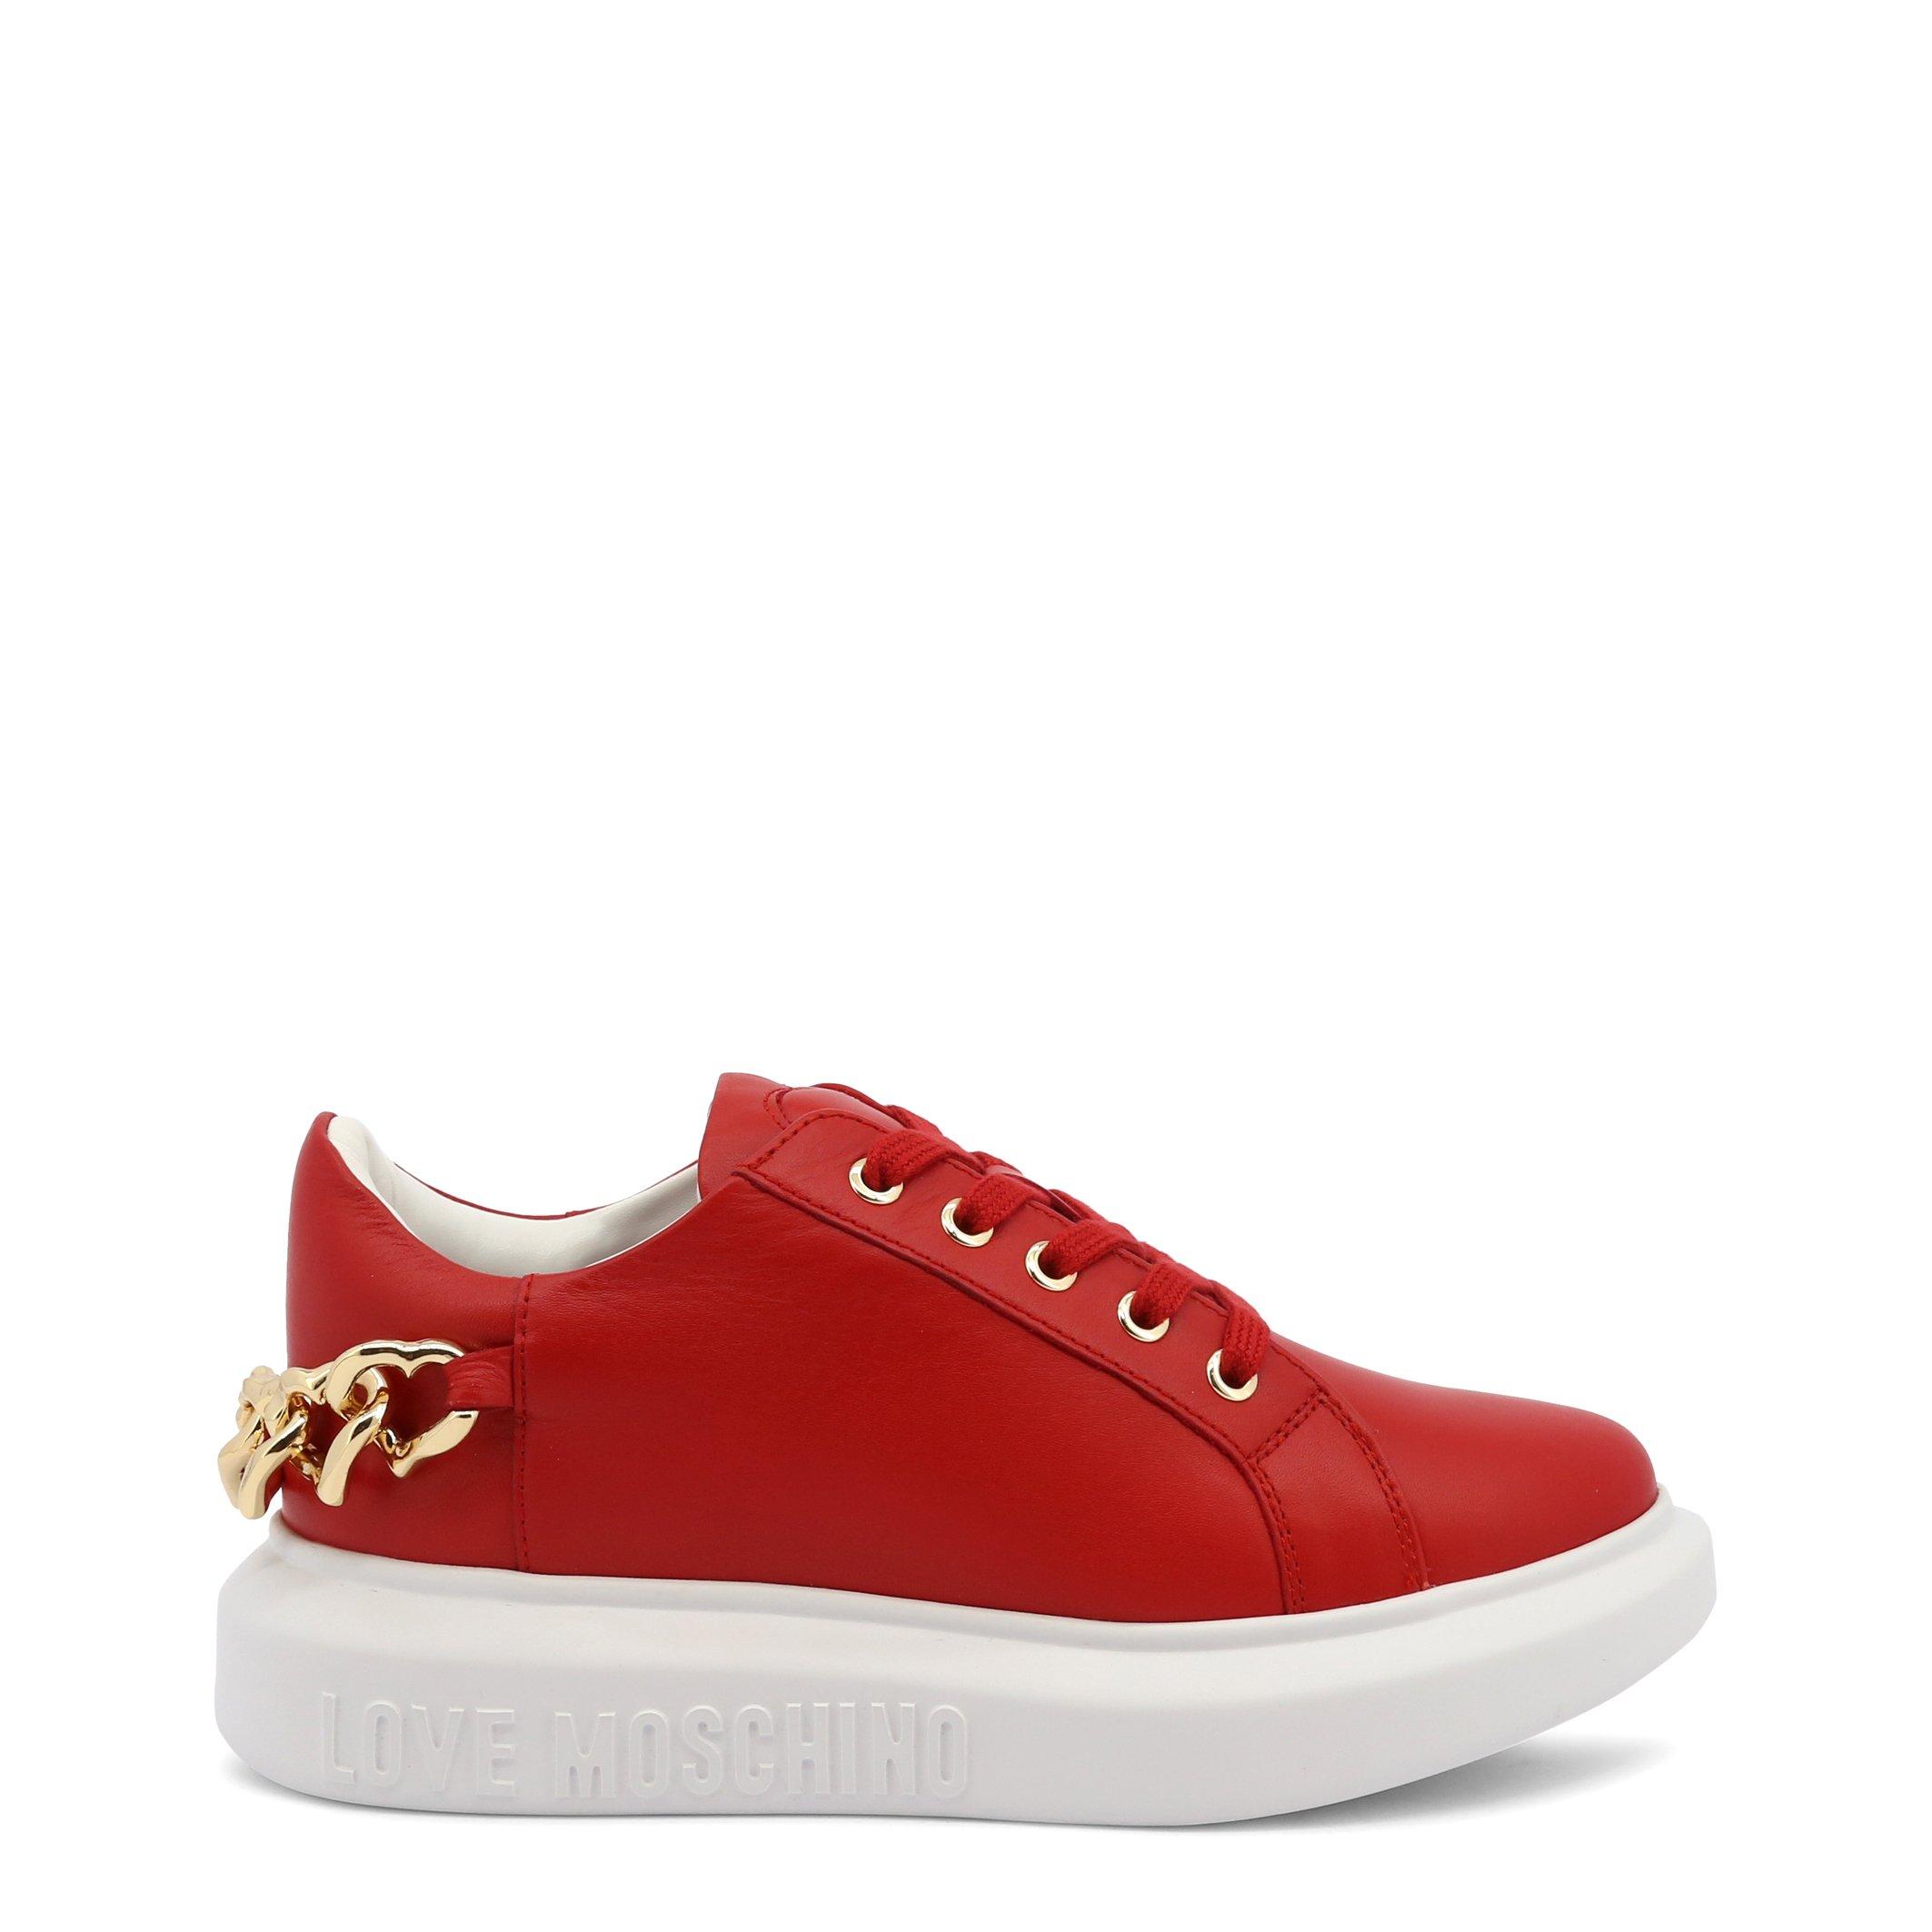 Love Moschino Women's Trainer Various Colours JA15144G1DIA0 - red EU 35